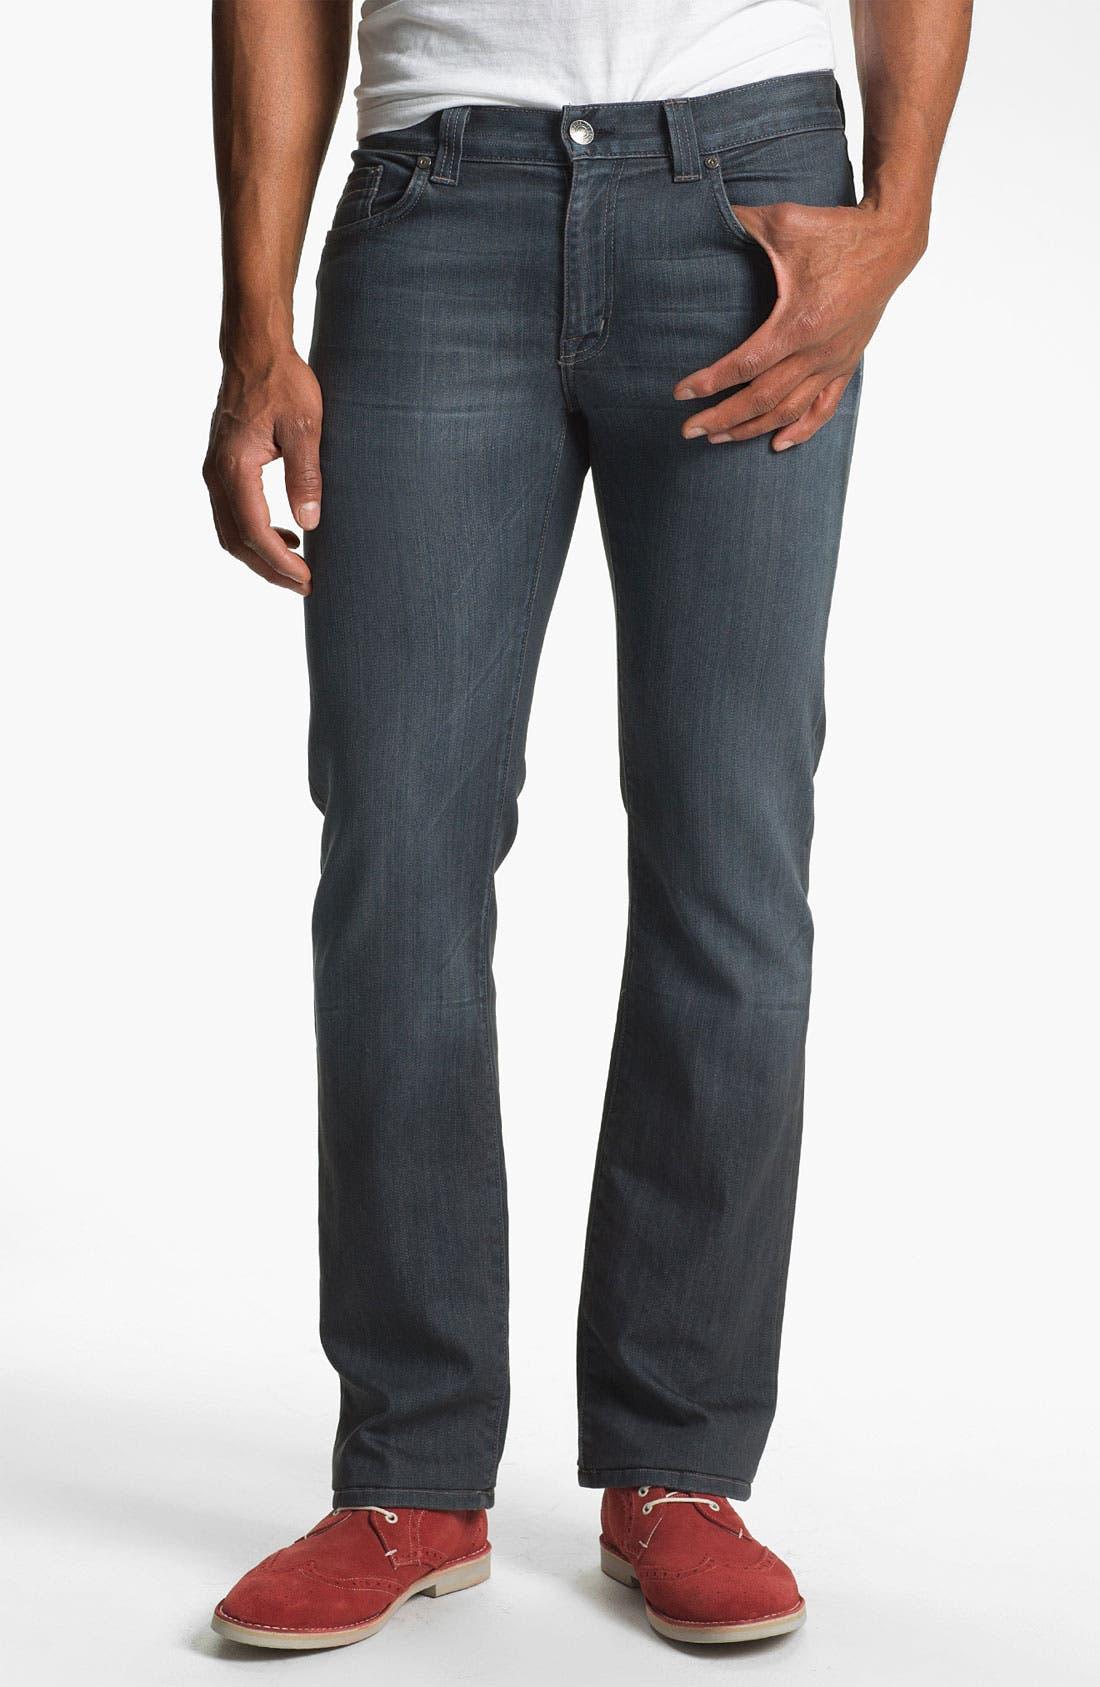 Alternate Image 1 Selected - Fidelity Denim '5011' Straight Leg Jeans (Diego Steel)